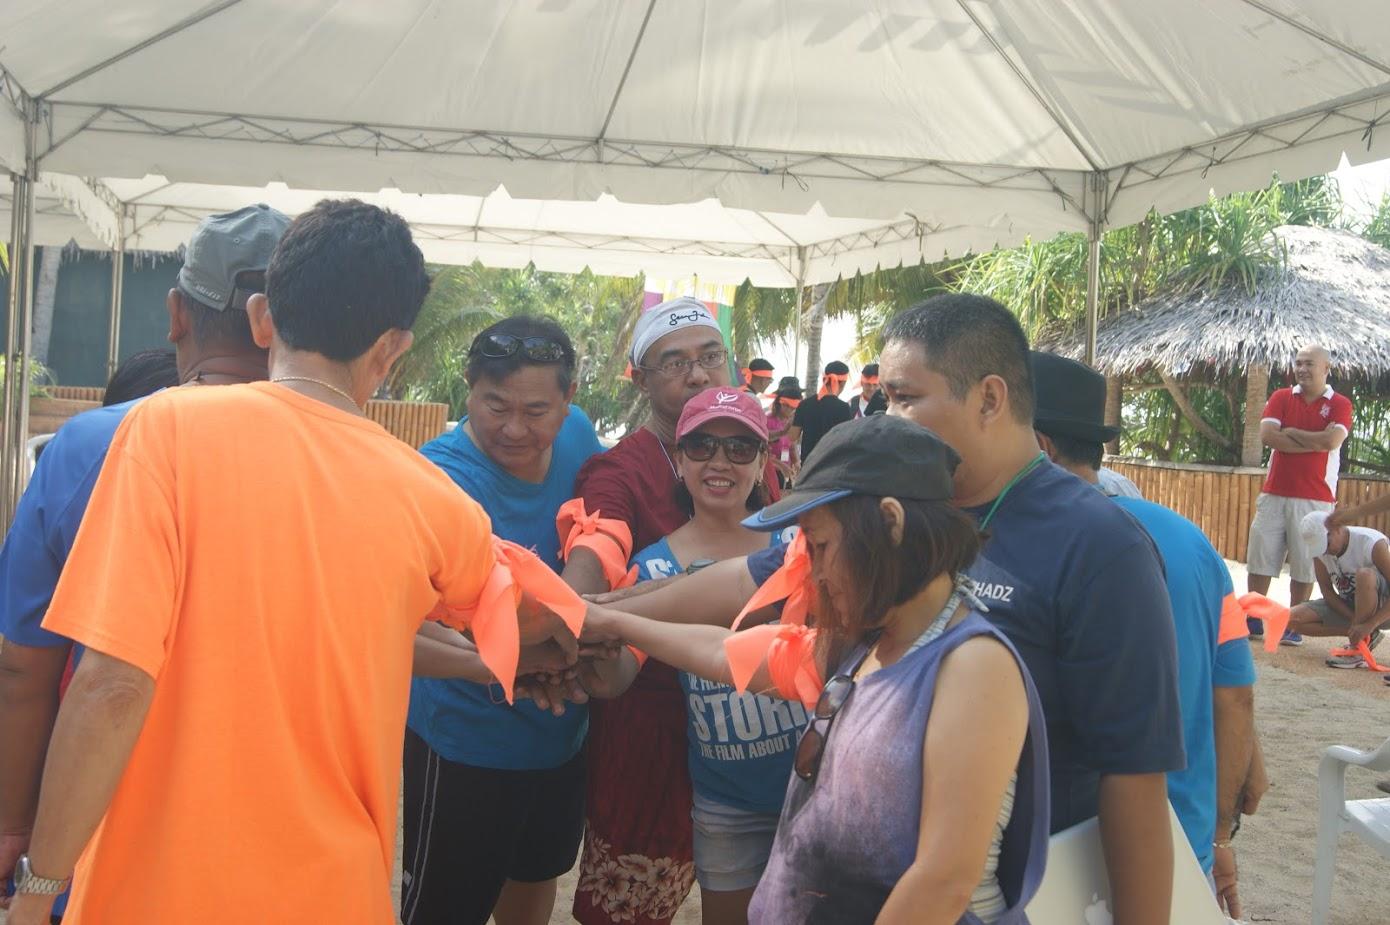 Cebu Teambuilding Services in 2015